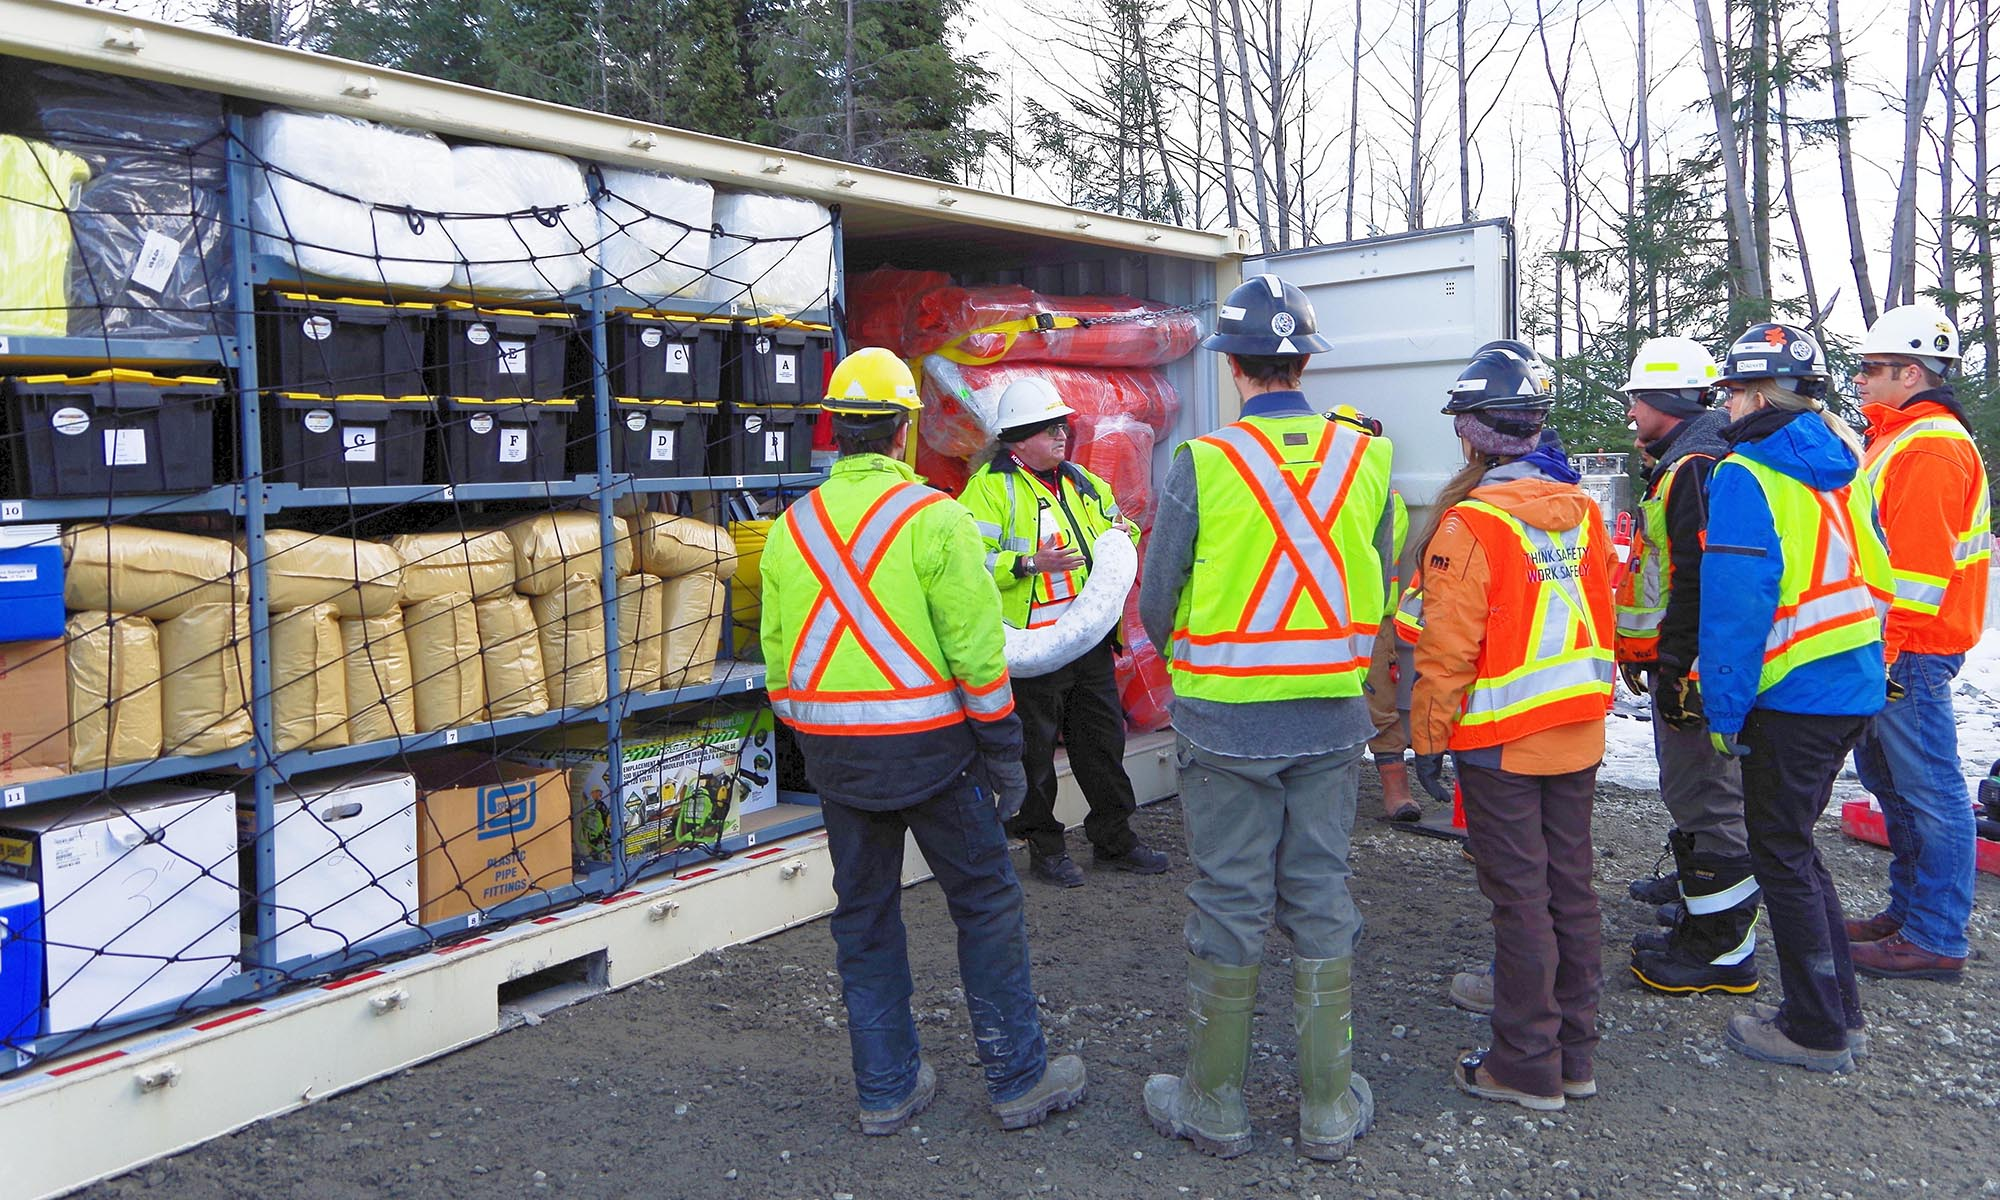 Spill Response Centre - SRC100kMax, Spill Response Centre – SRC100kMax, Spill Response Trailers...